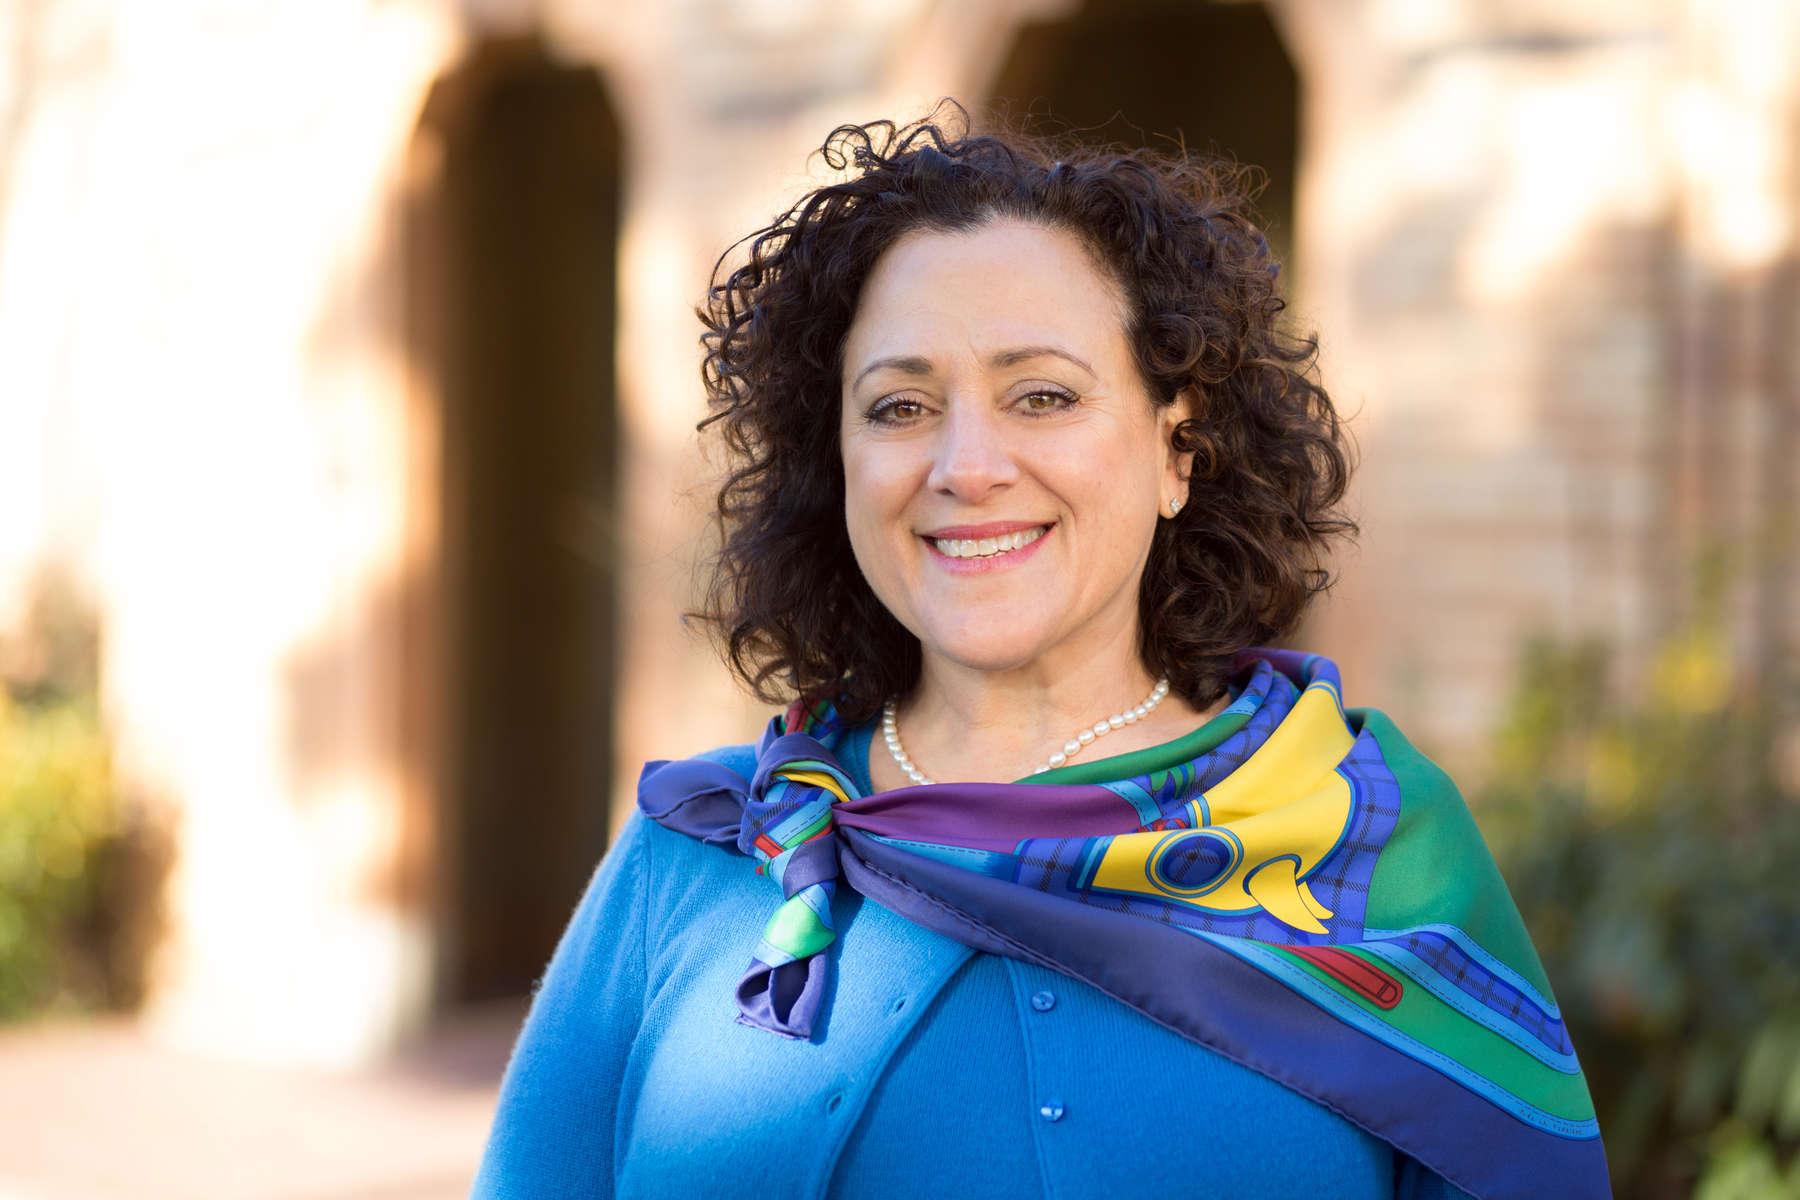 Linda Marzano, CMO of Pacific Medical Center